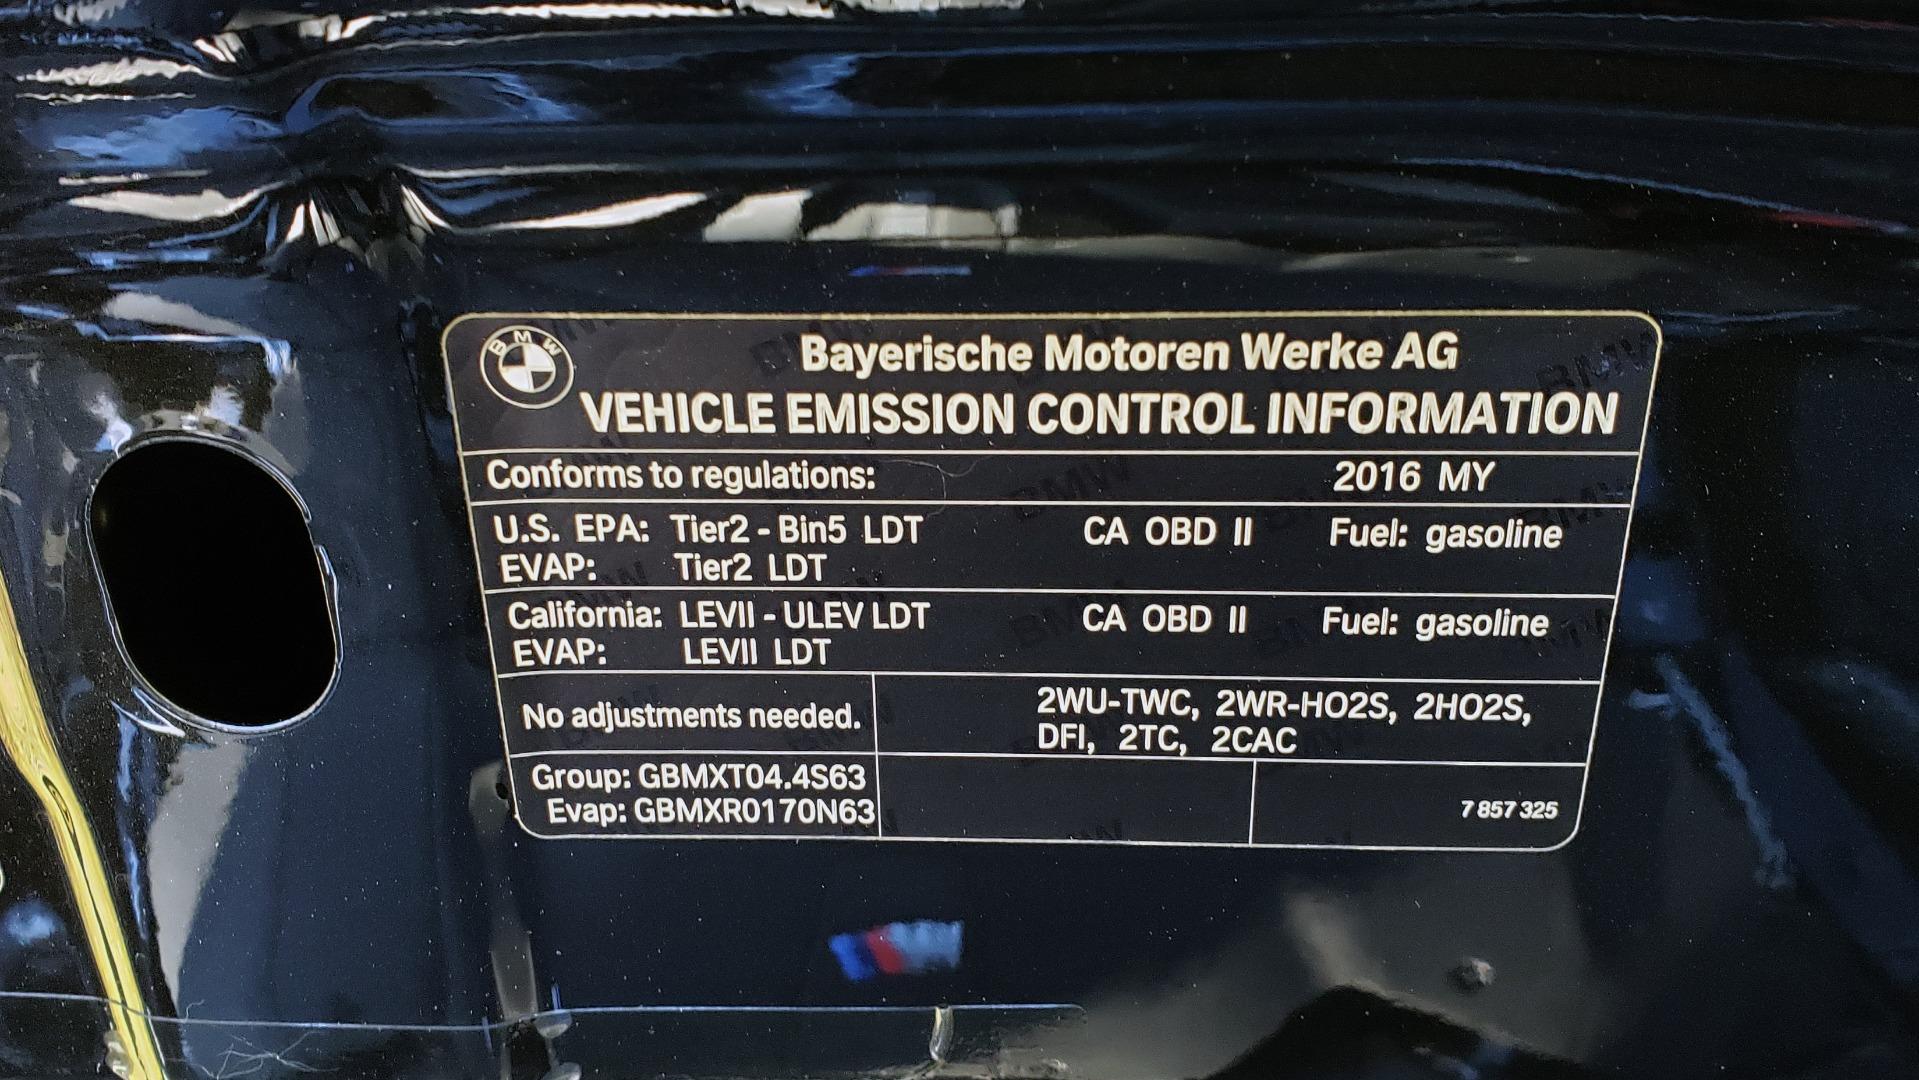 Used 2016 BMW X6 M EXEC PKG / DRVR ASST / NAV / SUNROOF / BLIND SPOT / REARVIEW for sale Sold at Formula Imports in Charlotte NC 28227 23